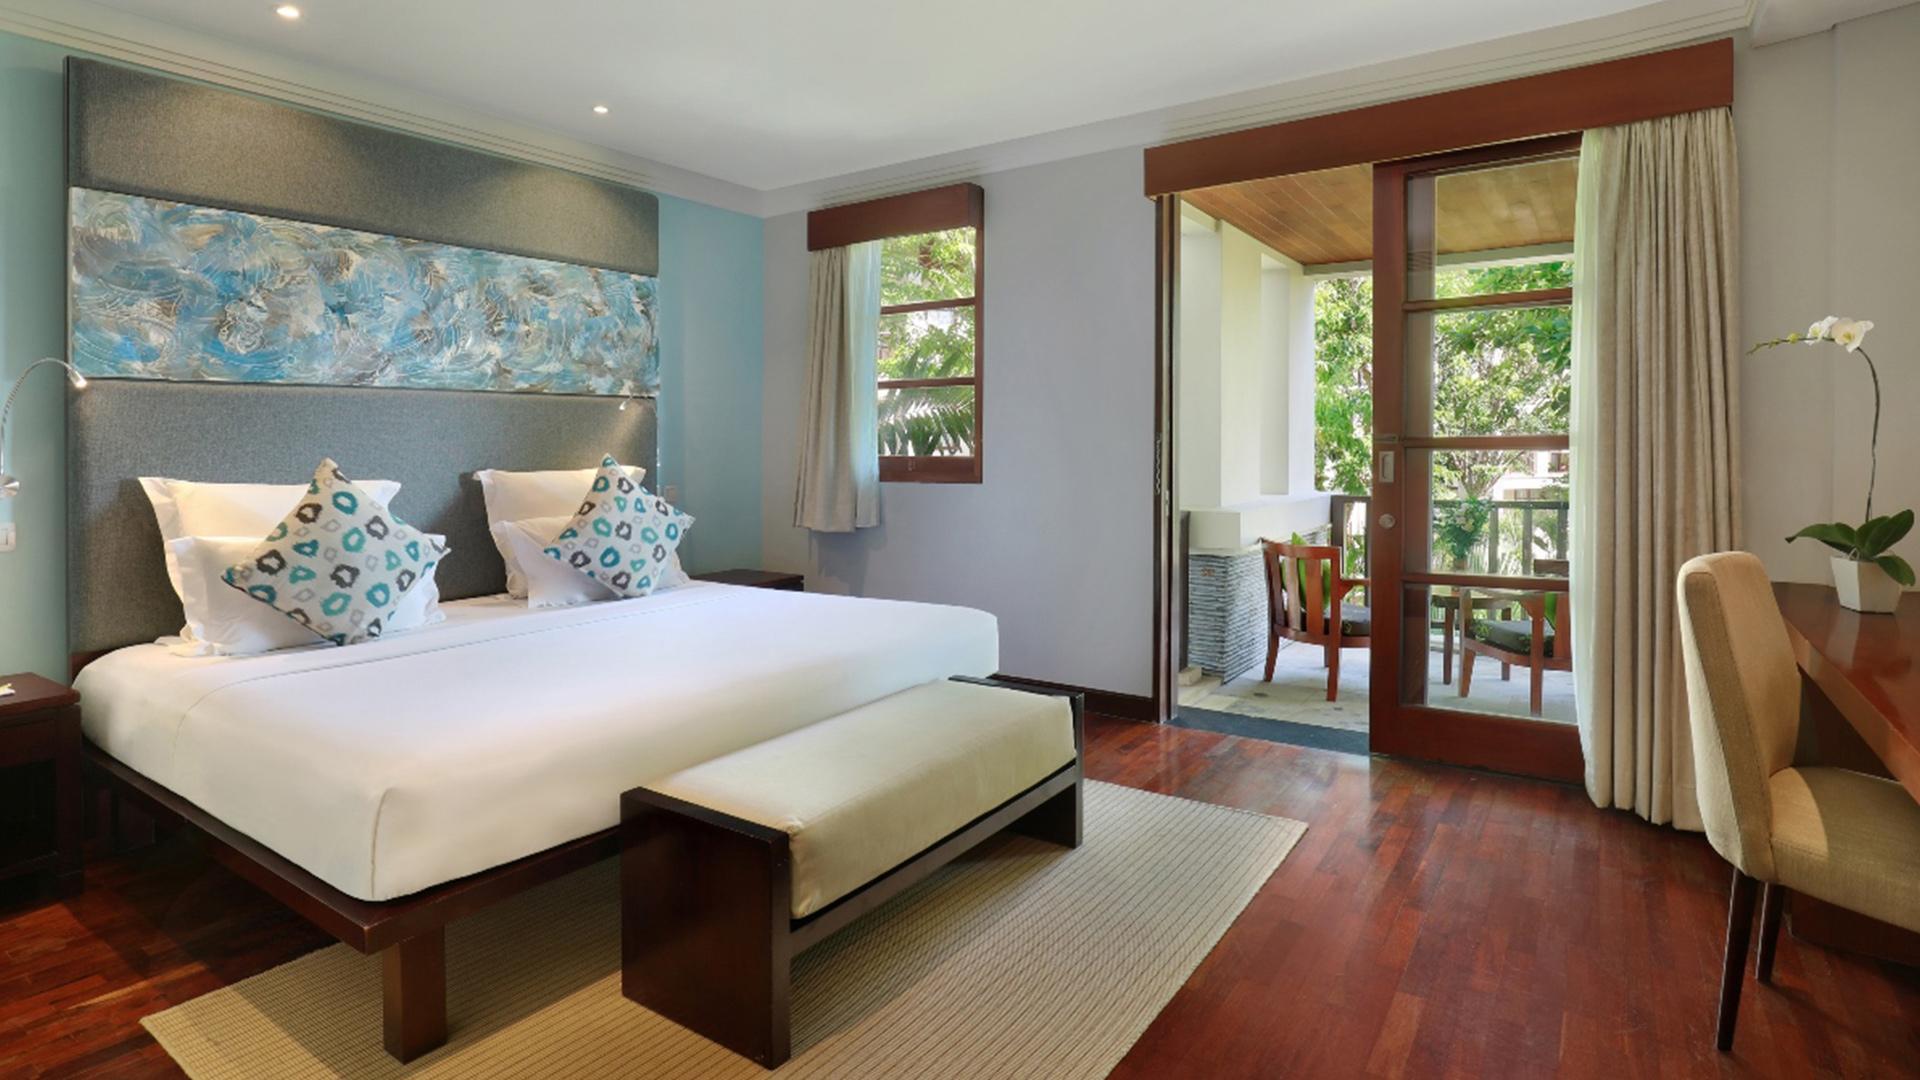 Two-Bedroom Apartment Suite image 1 at Novotel Bali Nusa Dua by Kabupatén Badung, Bali, Indonesia